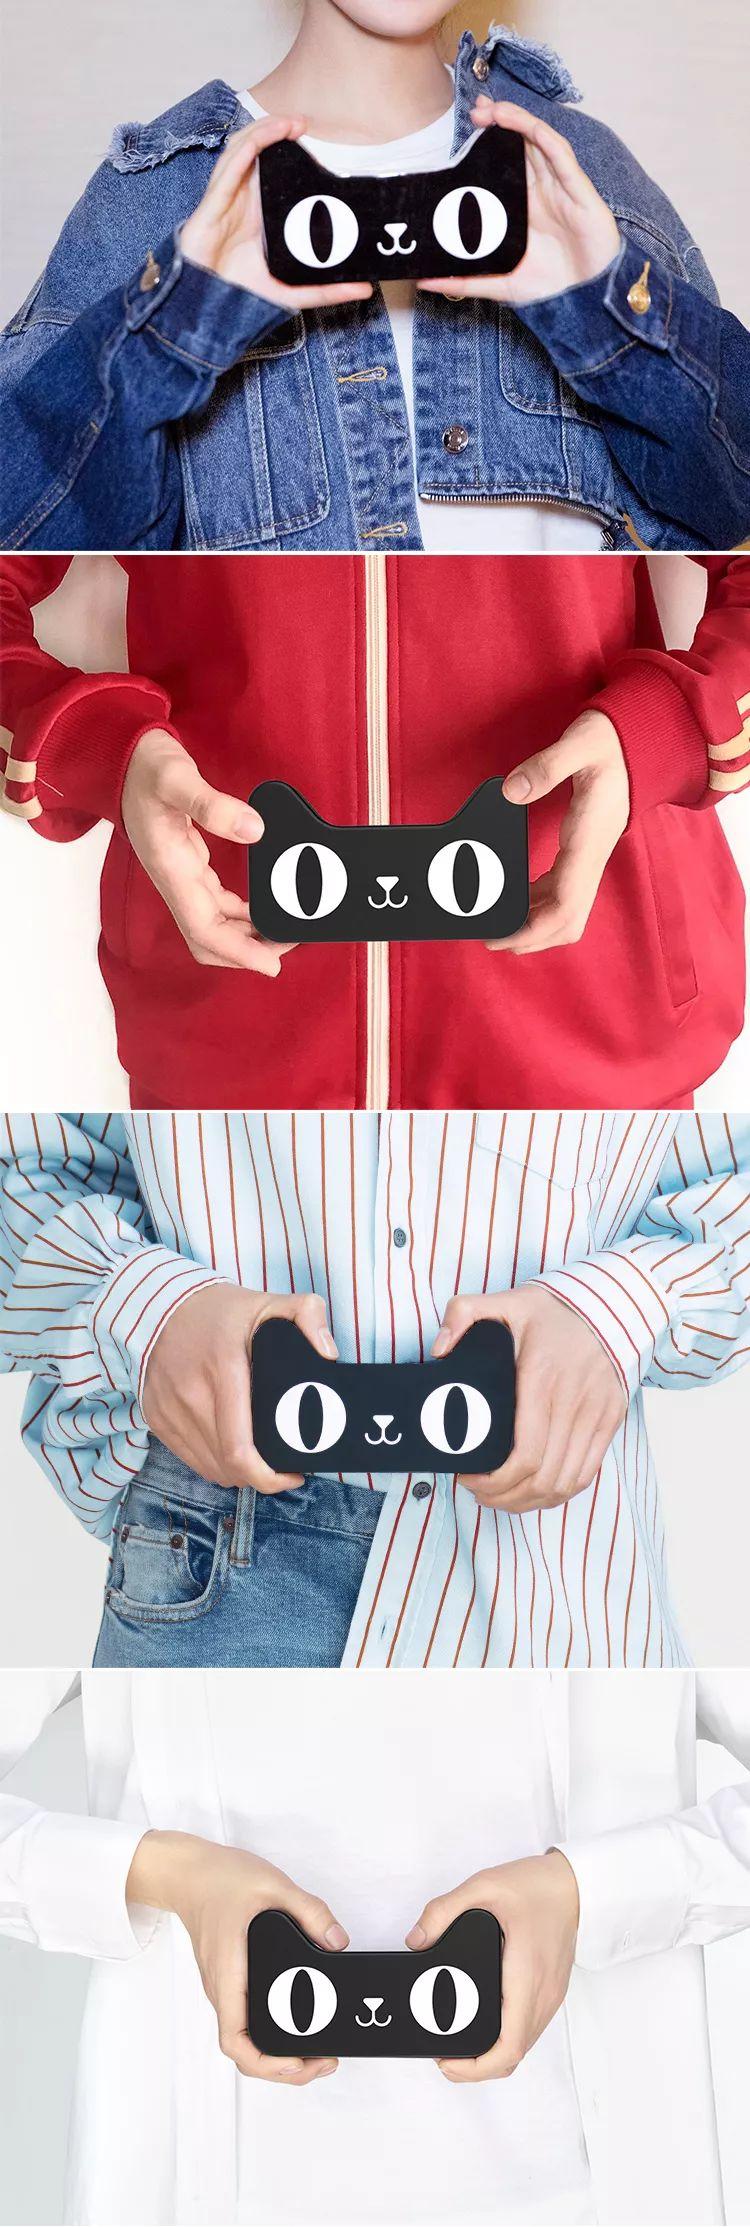 天猫logo设计